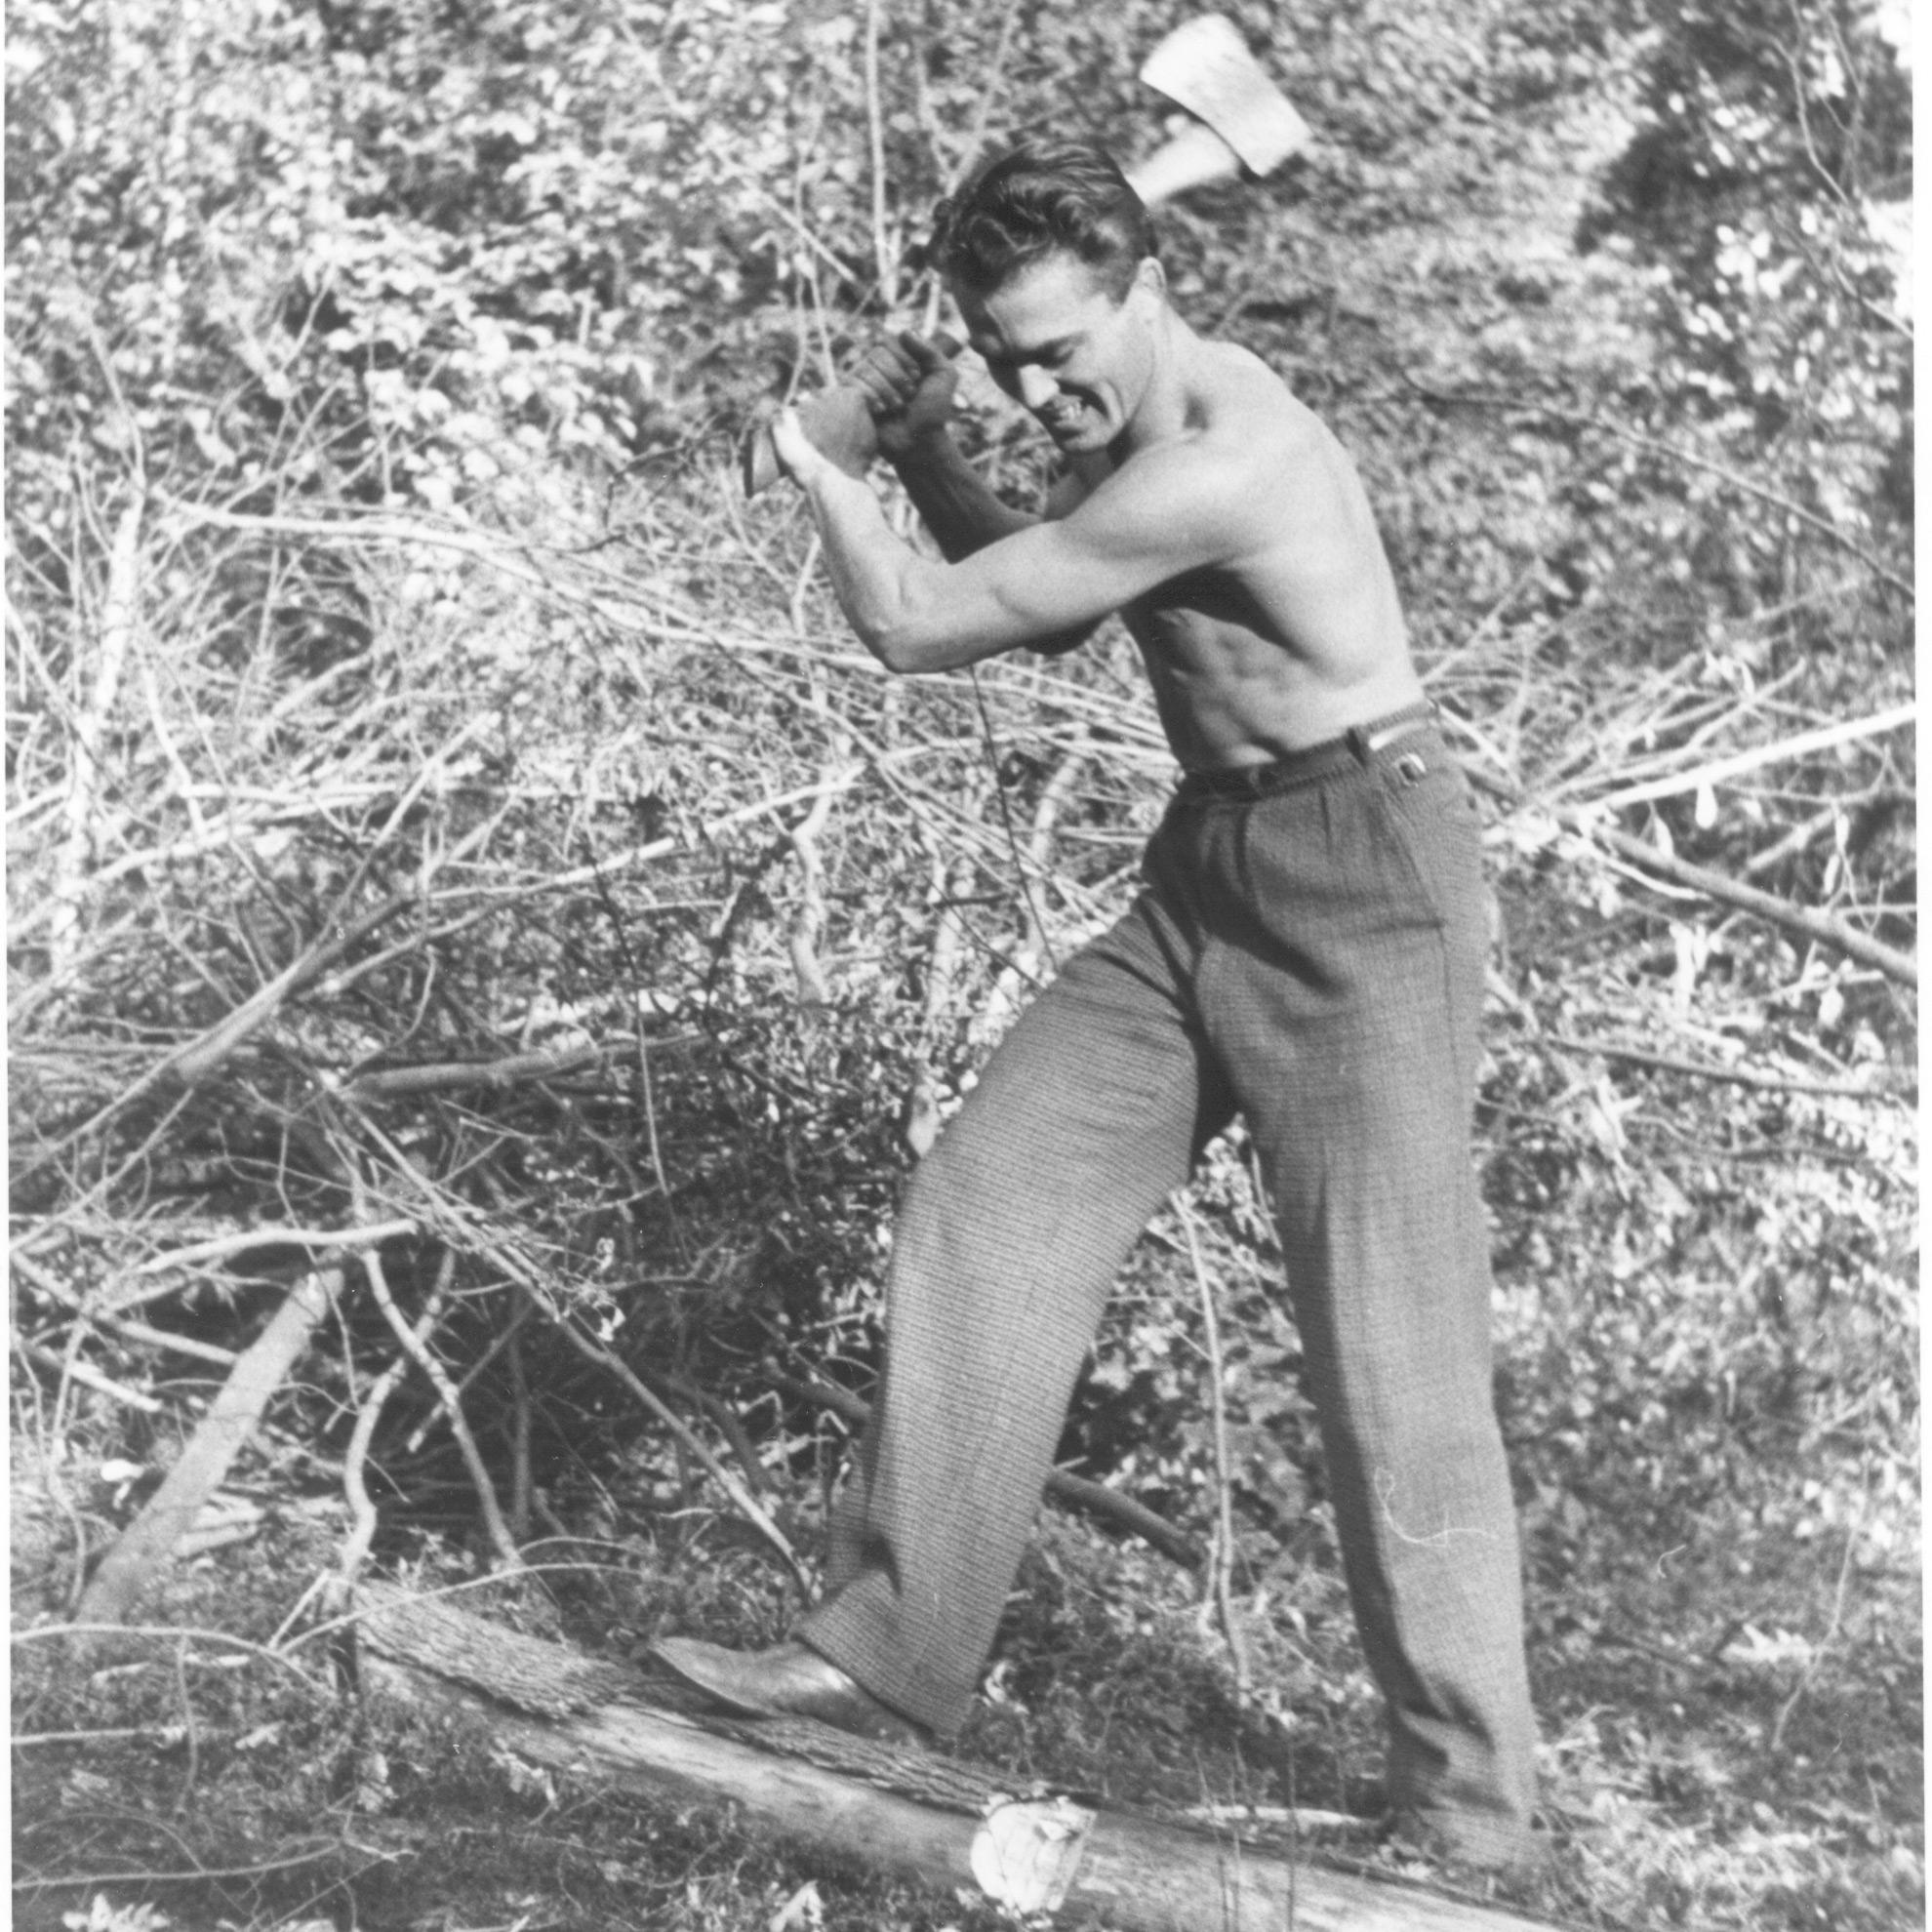 Horace Jones chopping wood